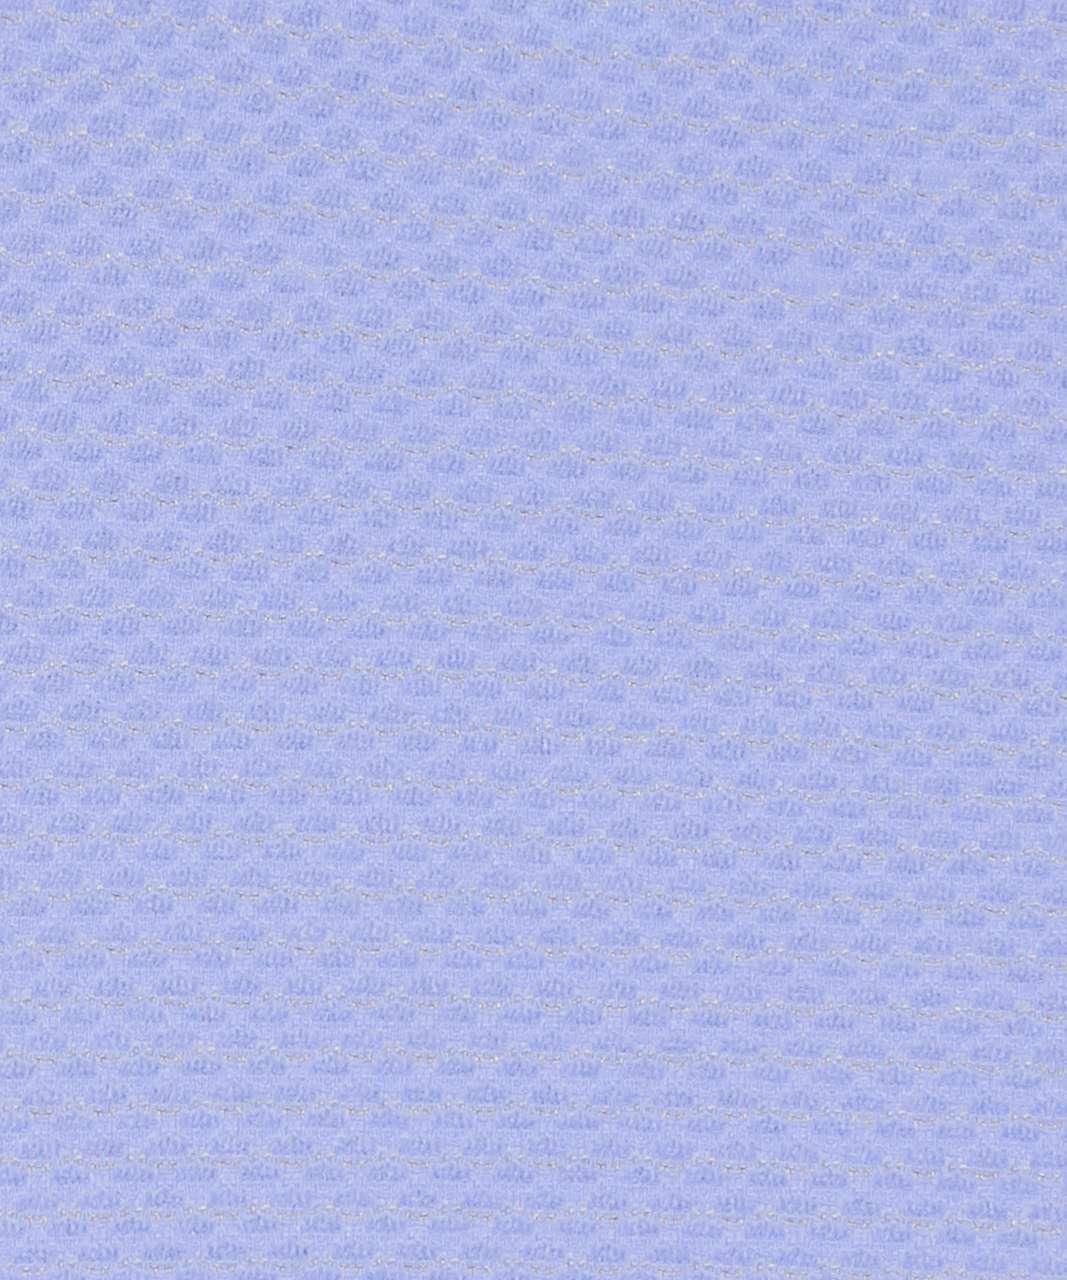 Lululemon Essential Tank *Scallop Texture - Hydrangea Blue